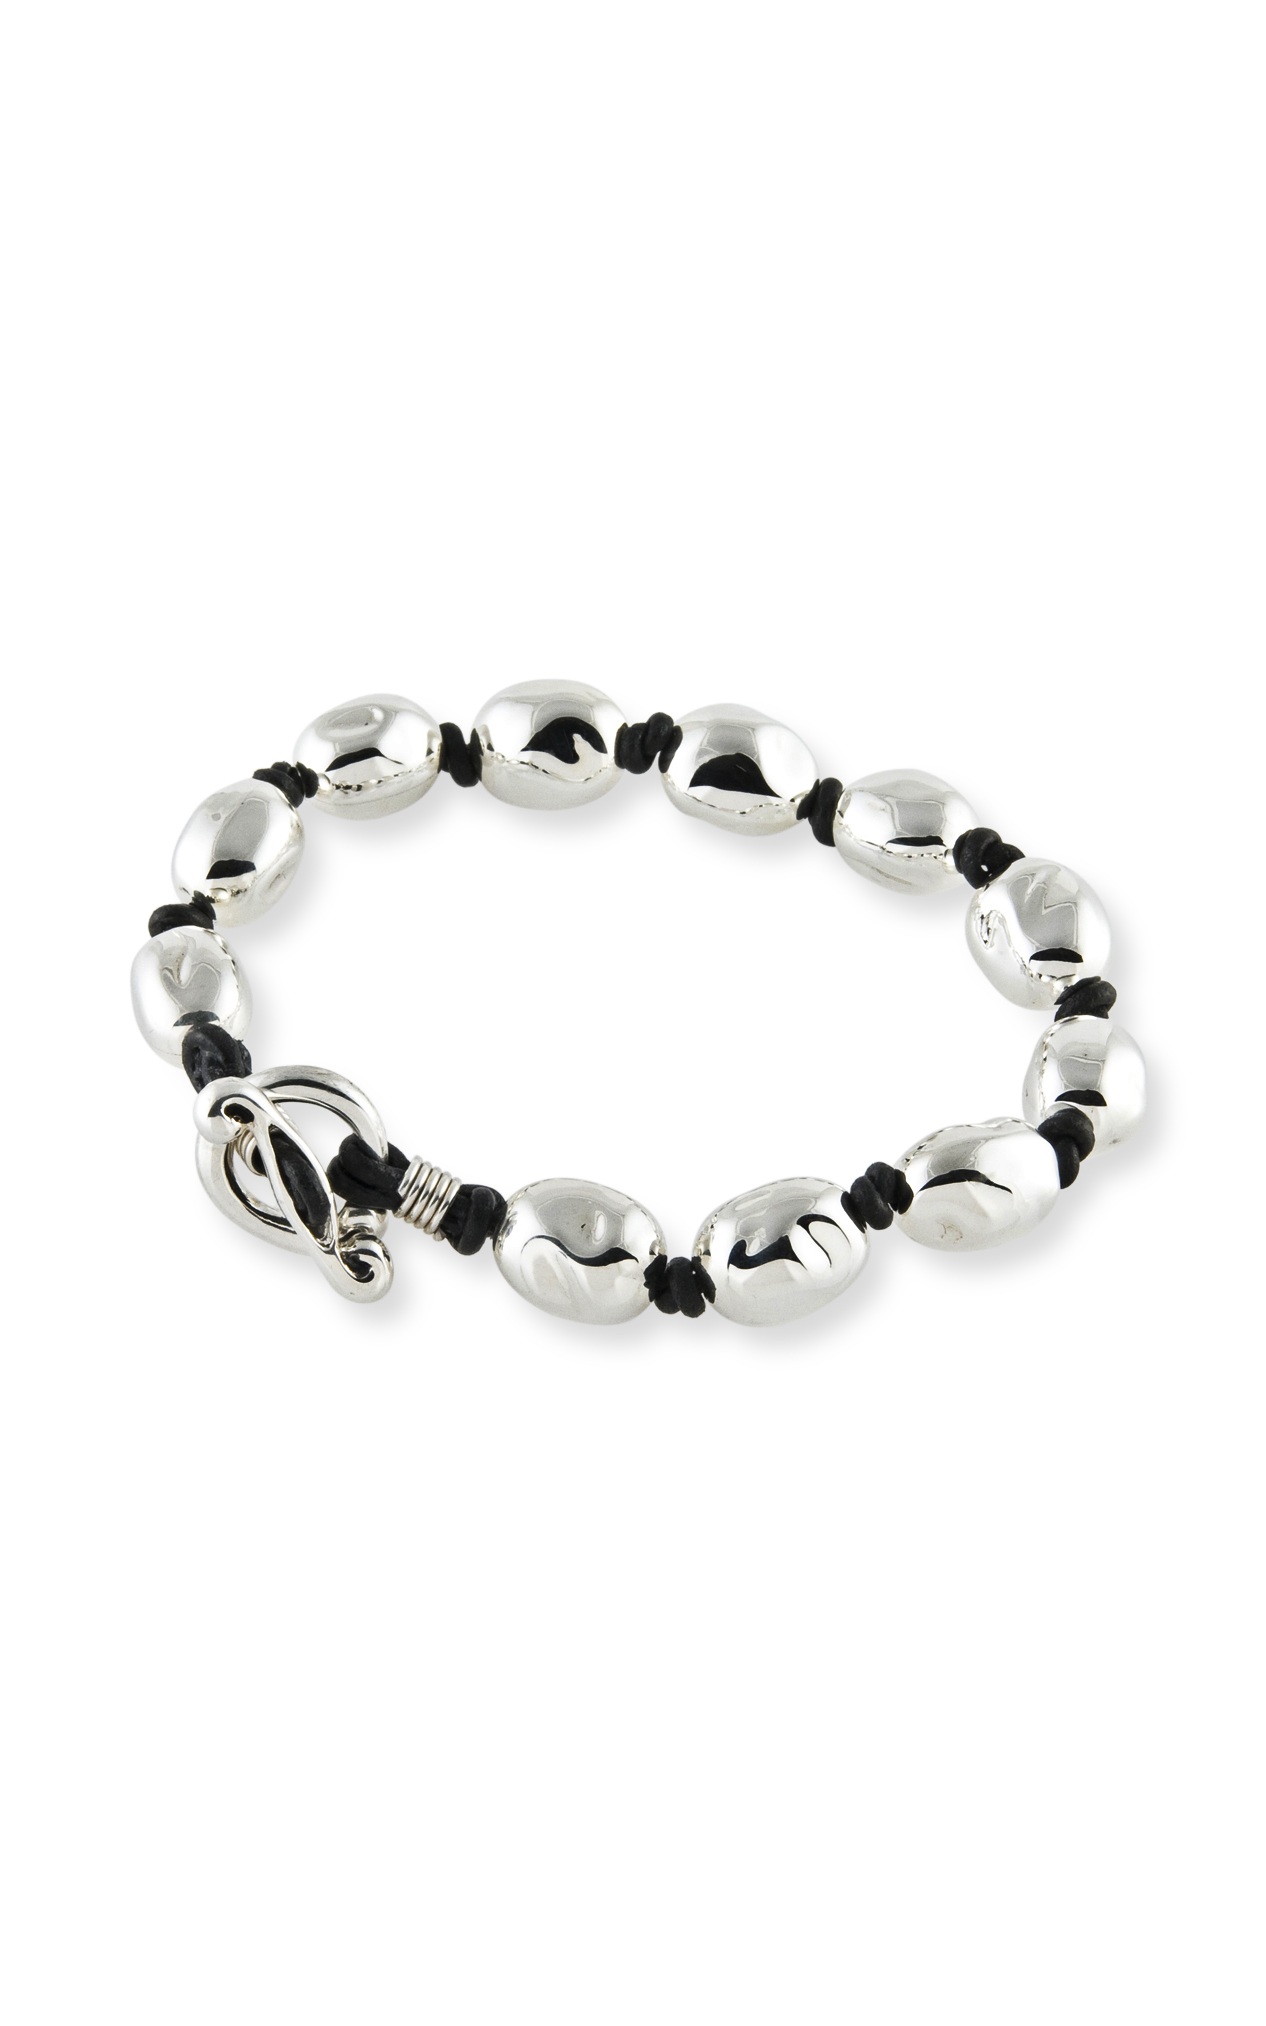 Zina Touchstone Bracelet A375-7-L product image